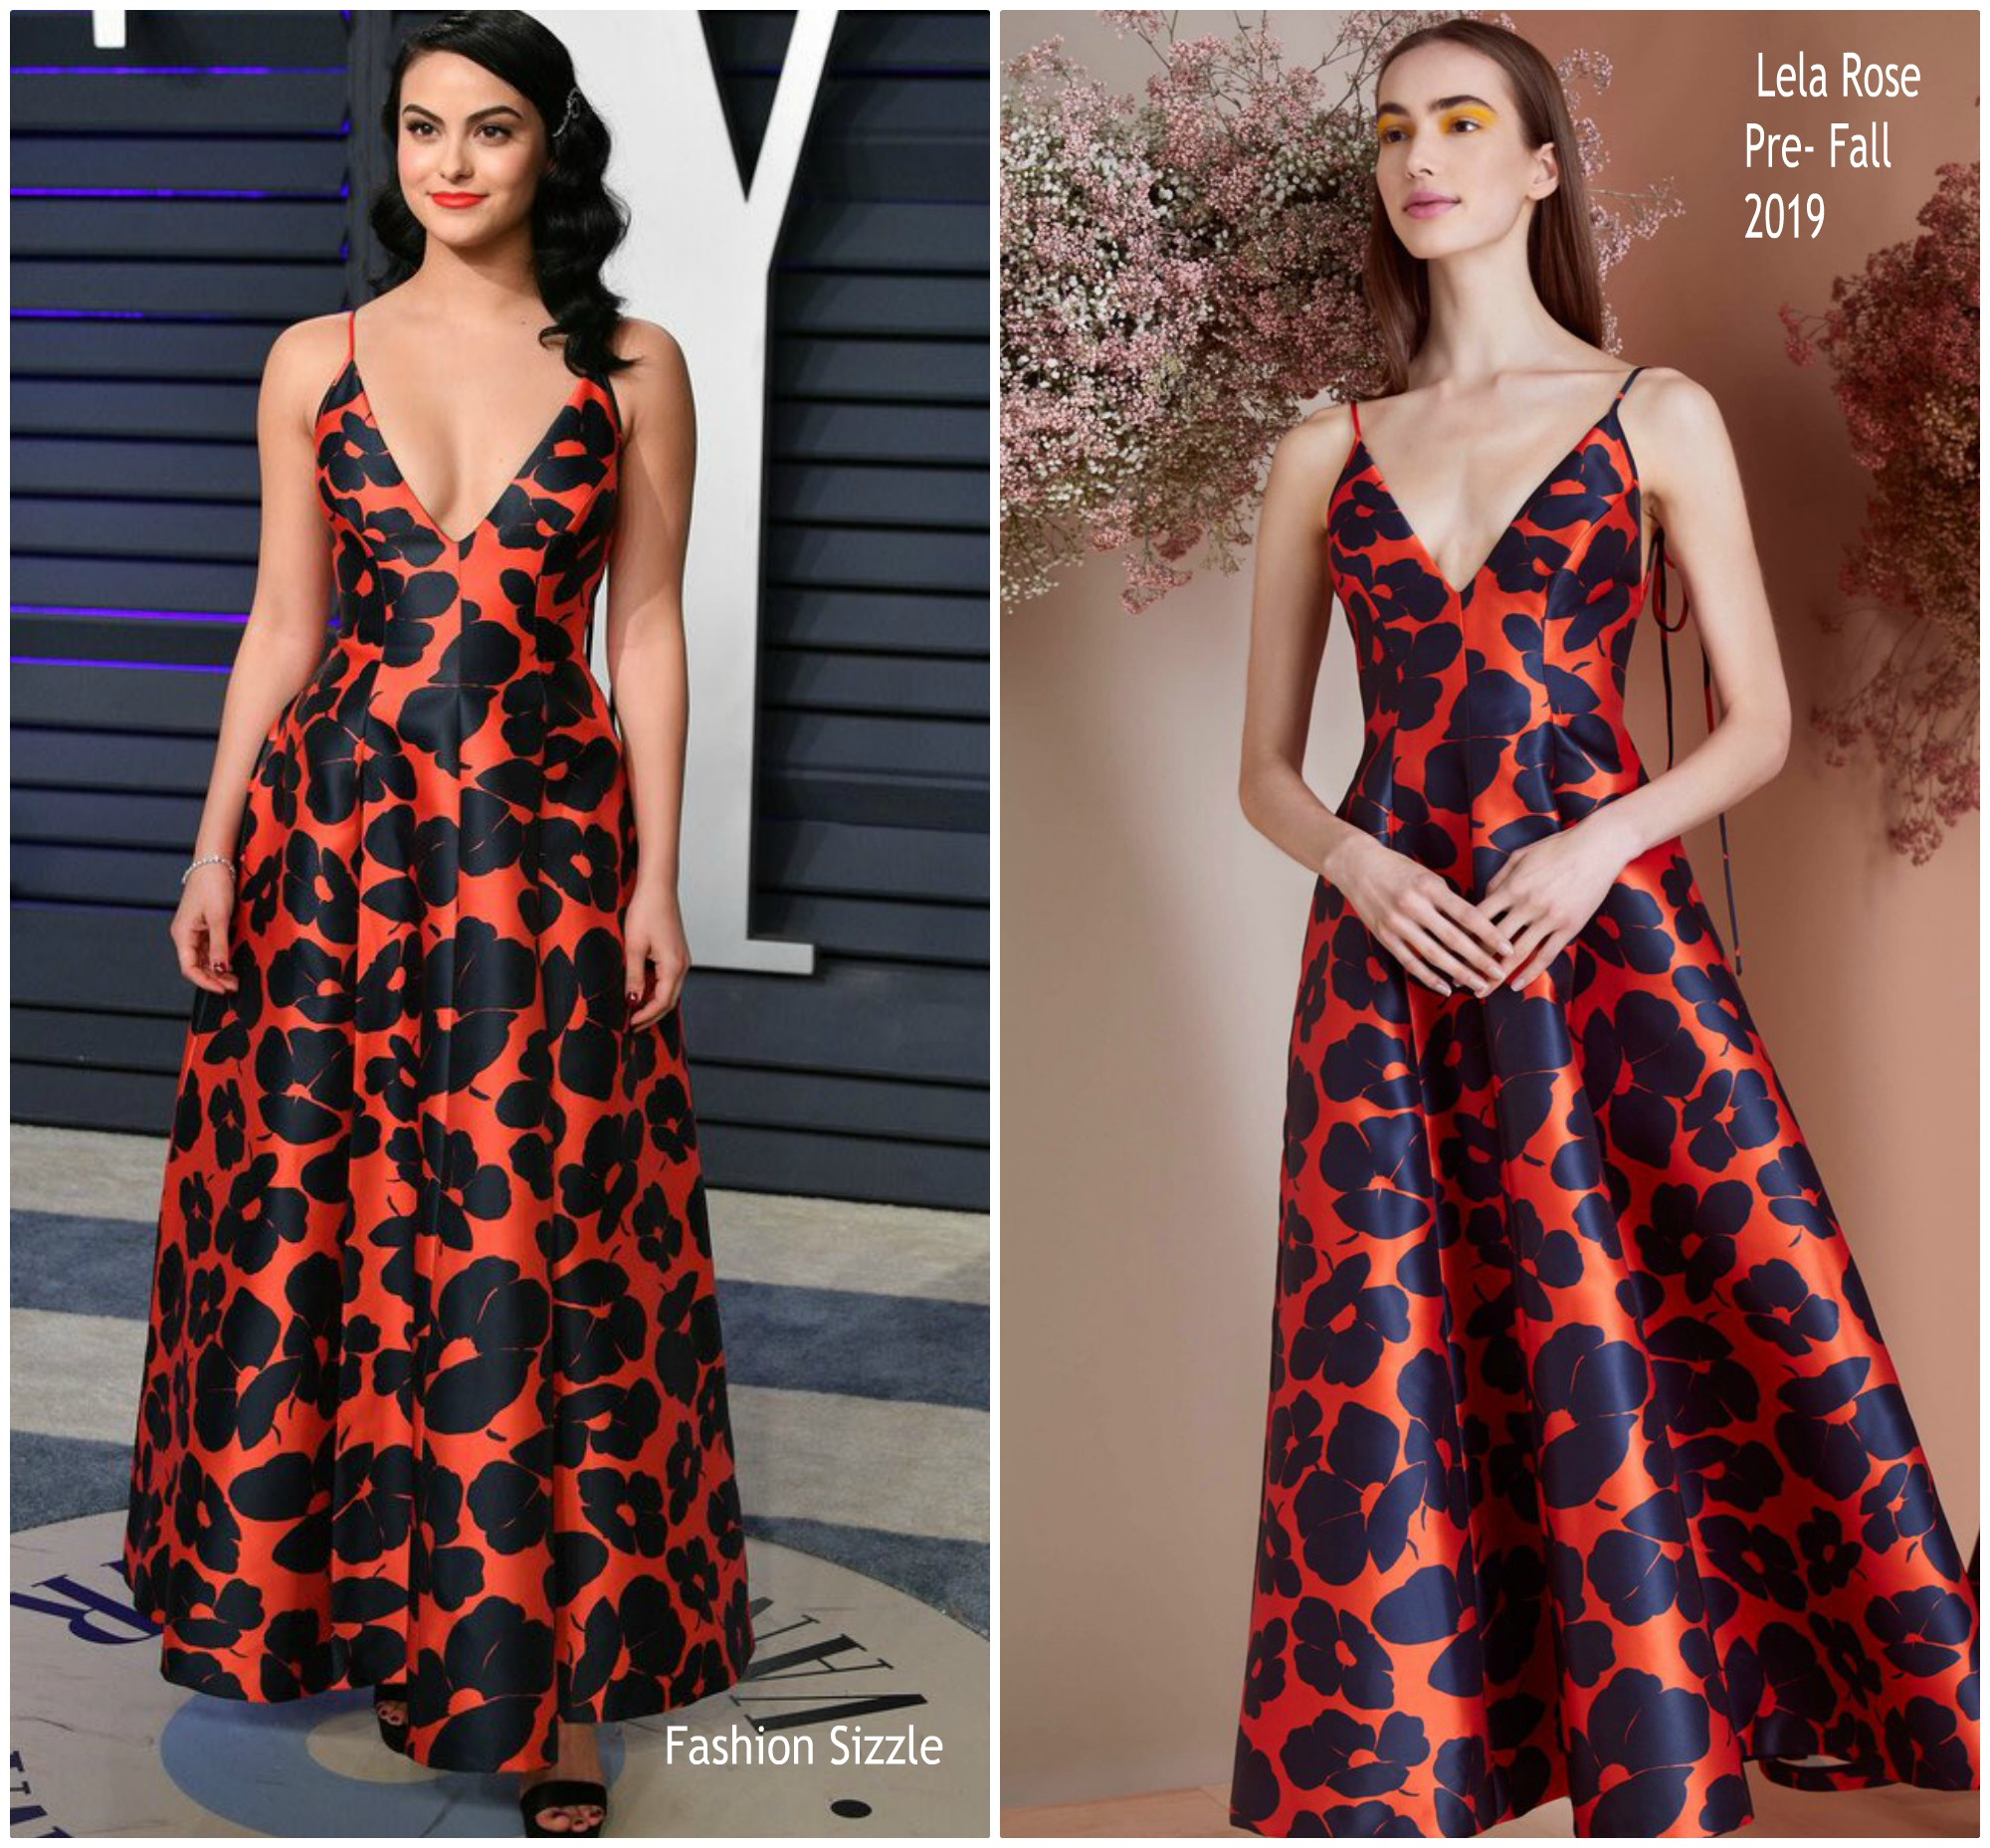 camila-mendes-in-lela-rose-2019-vanity-fair-oscar-party